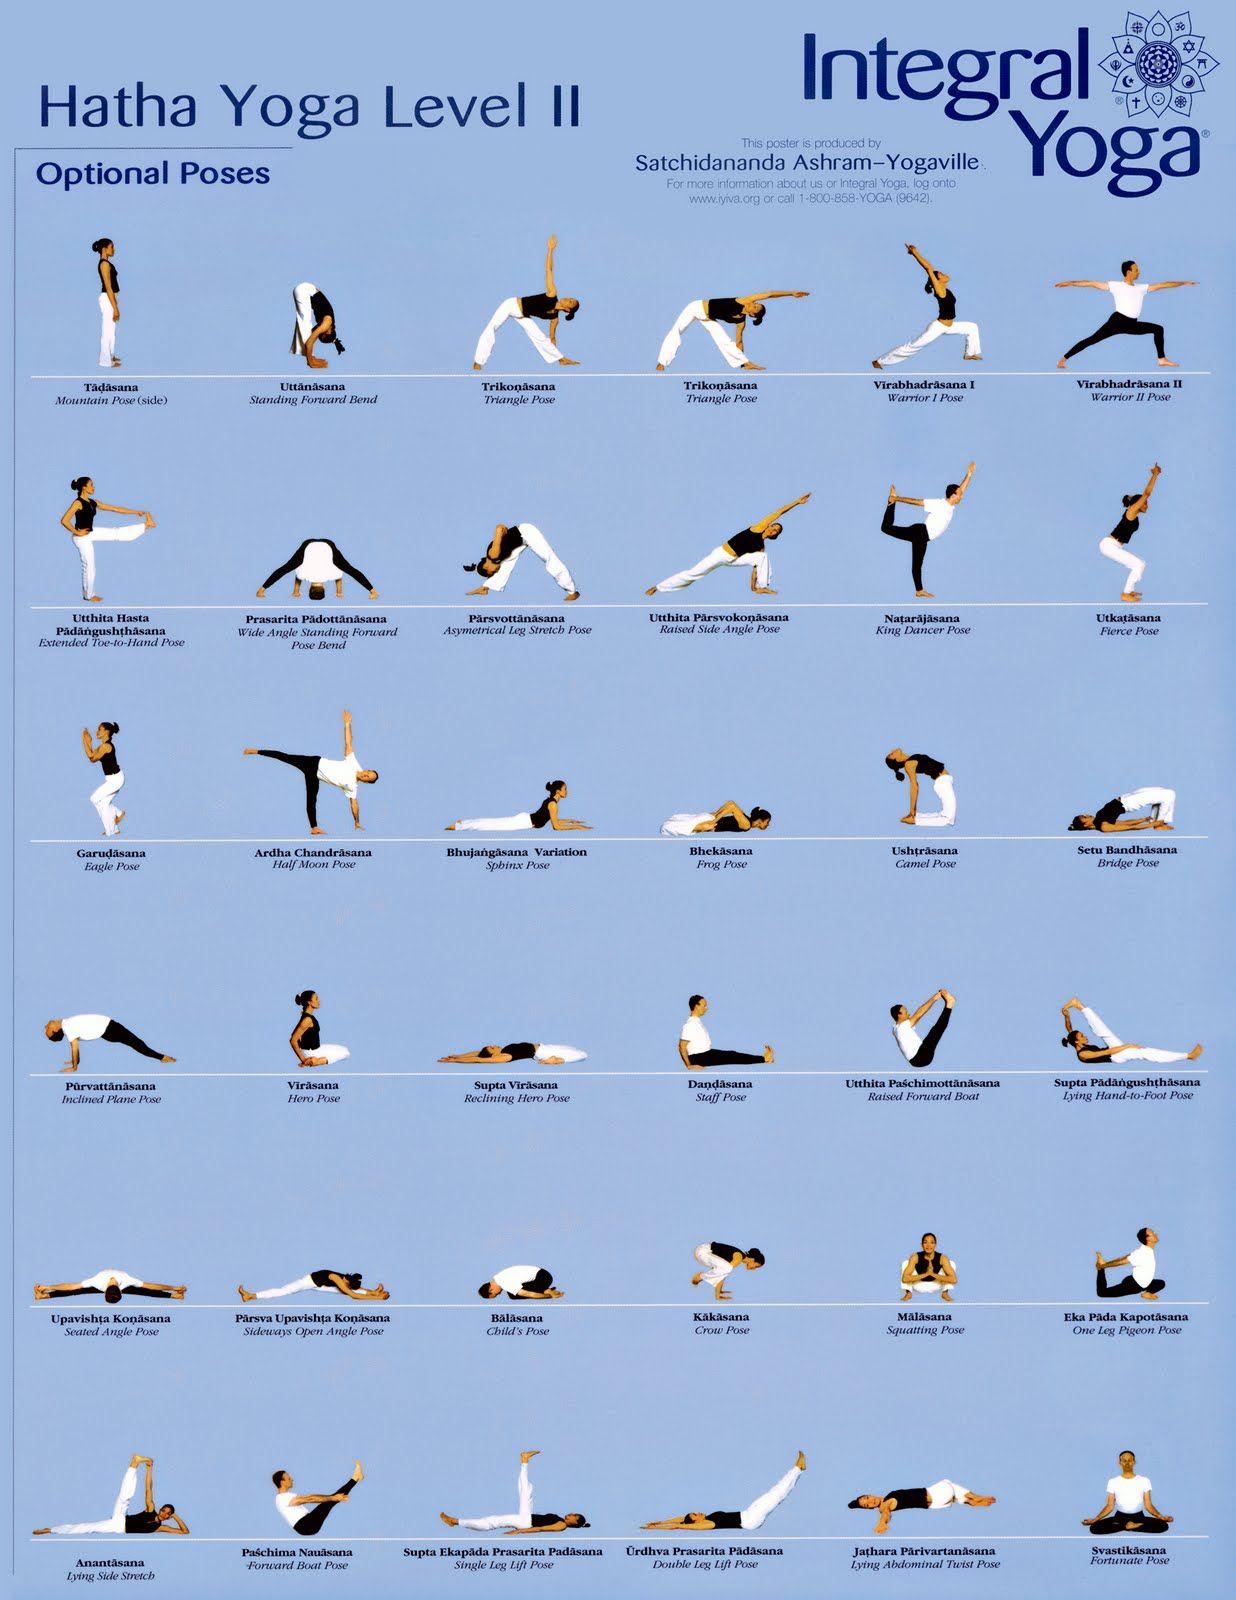 Your Yoga Class Hatha Yoga Poses Yoga Moves For Beginners Basic Yoga